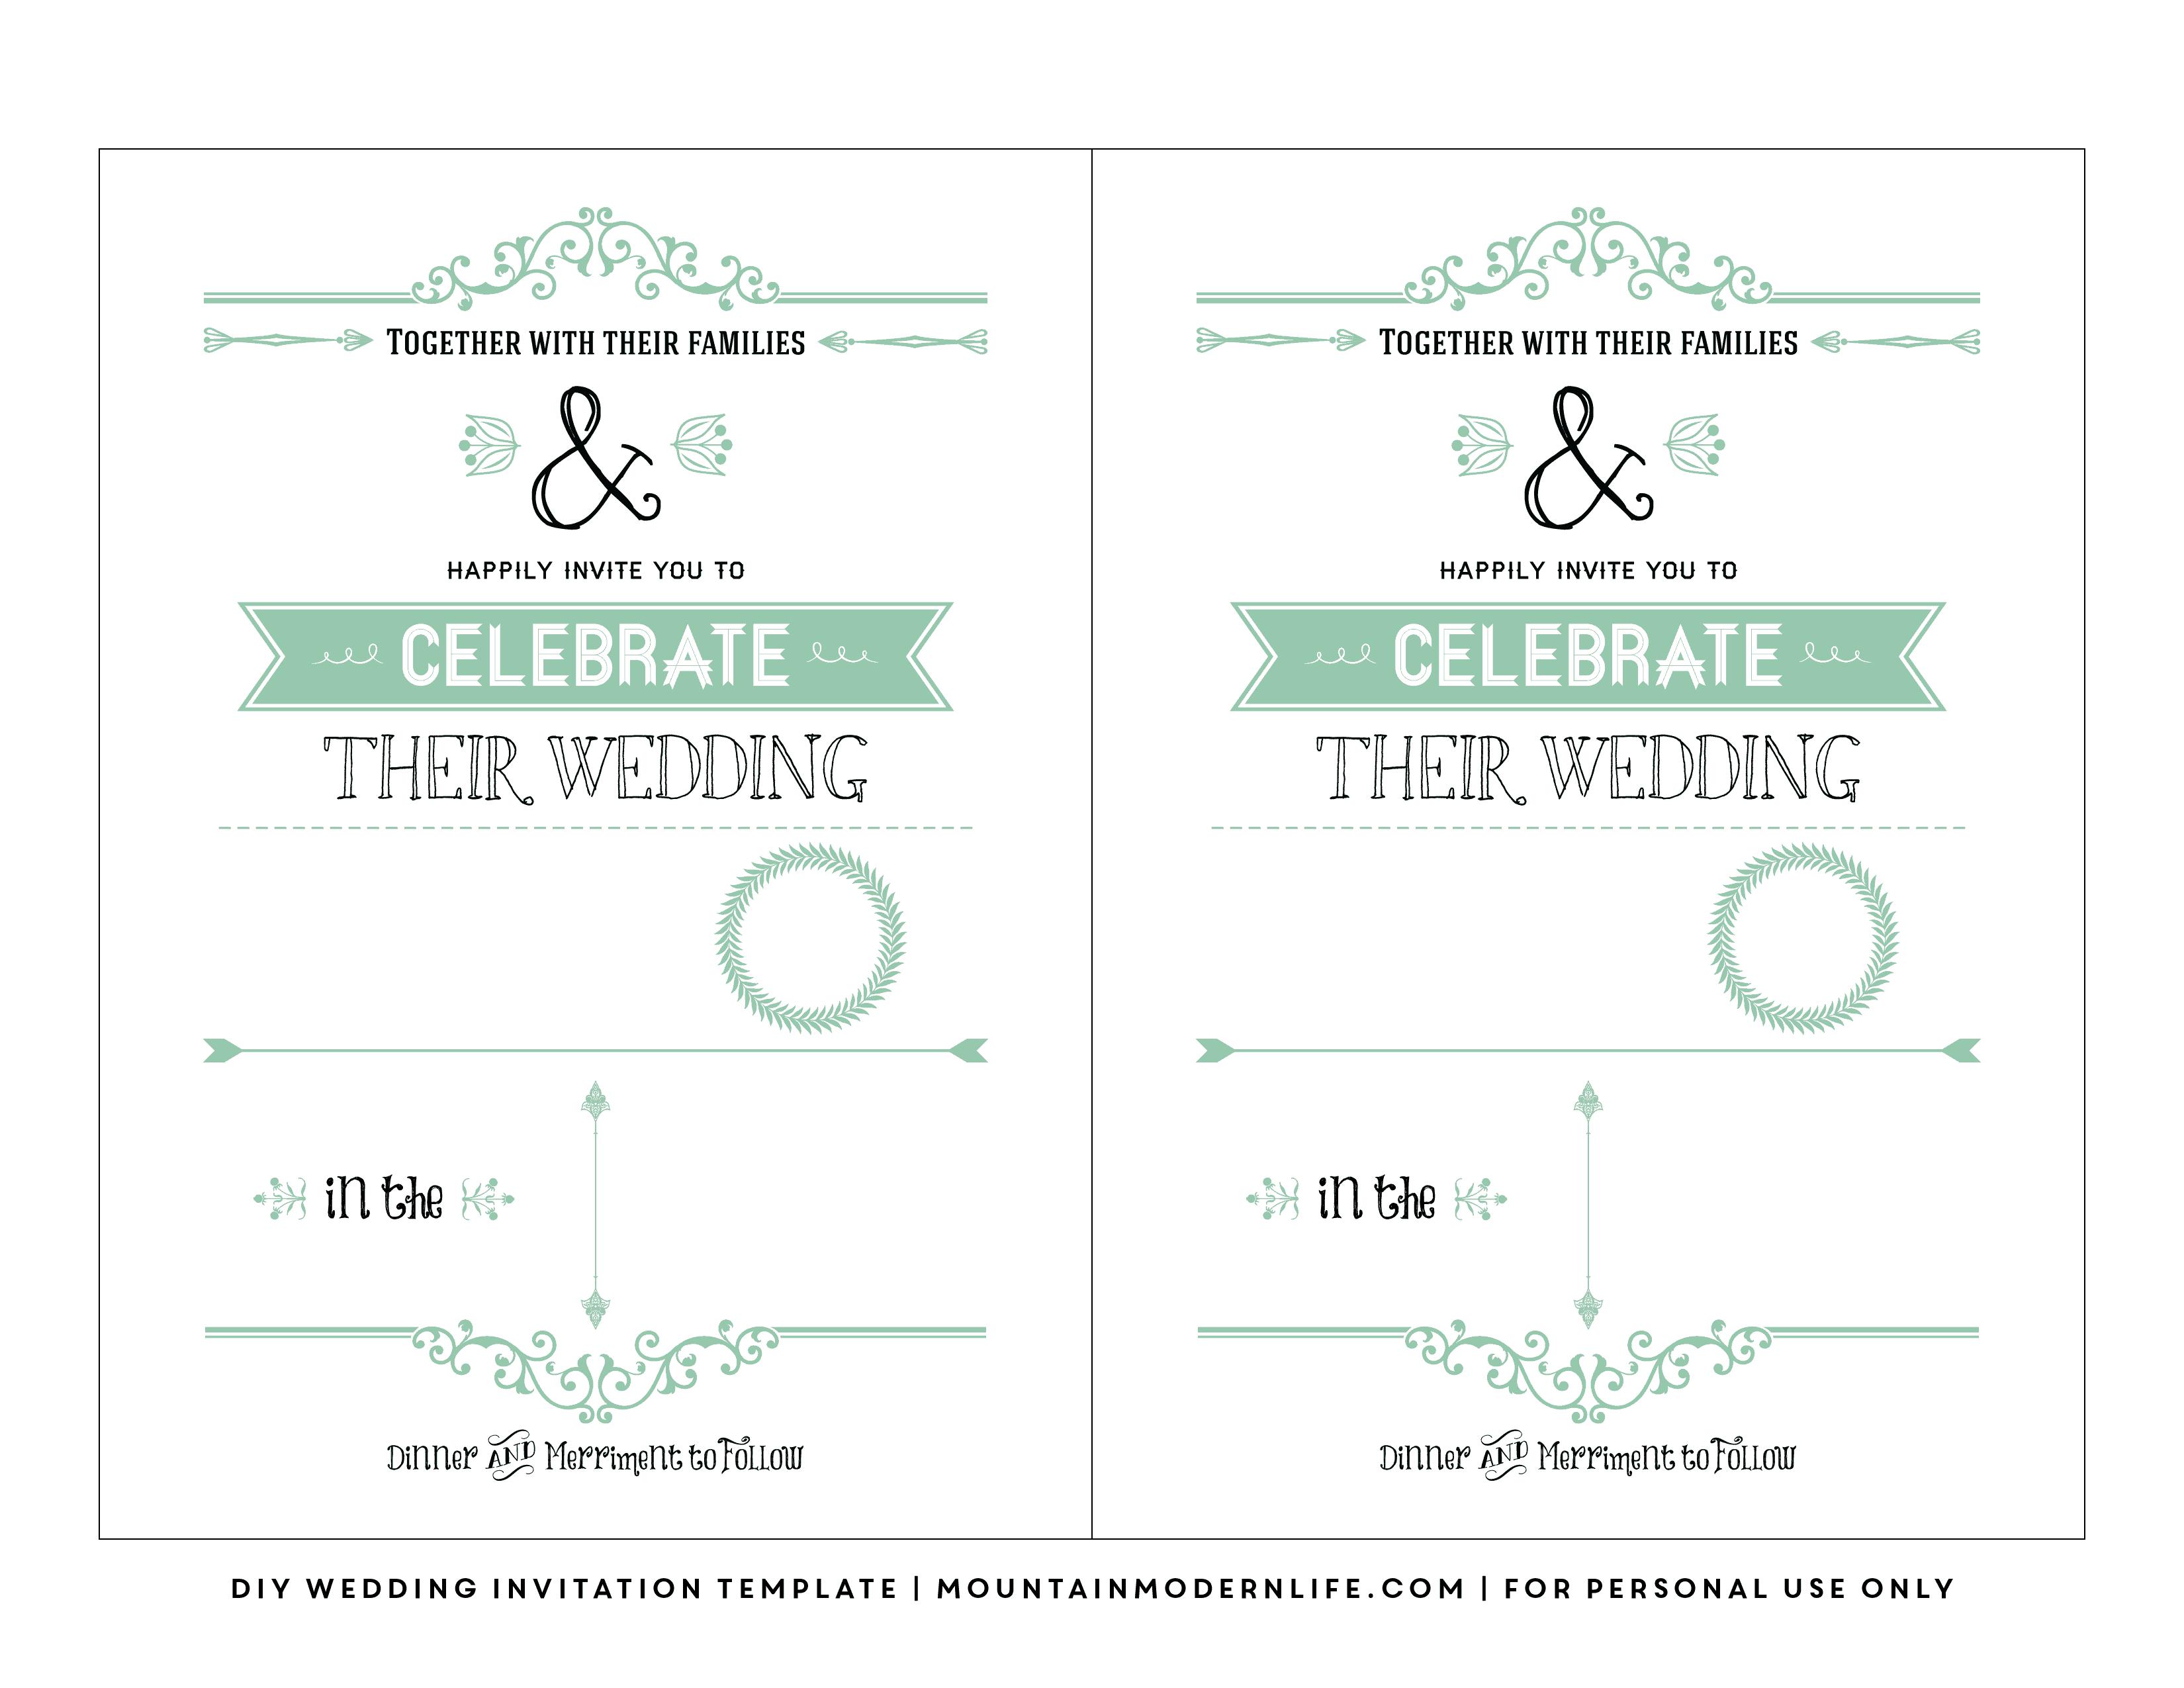 Free Wedding Invitation Template | Mountainmodernlife - Free Printable Wedding Invitations Templates Downloads